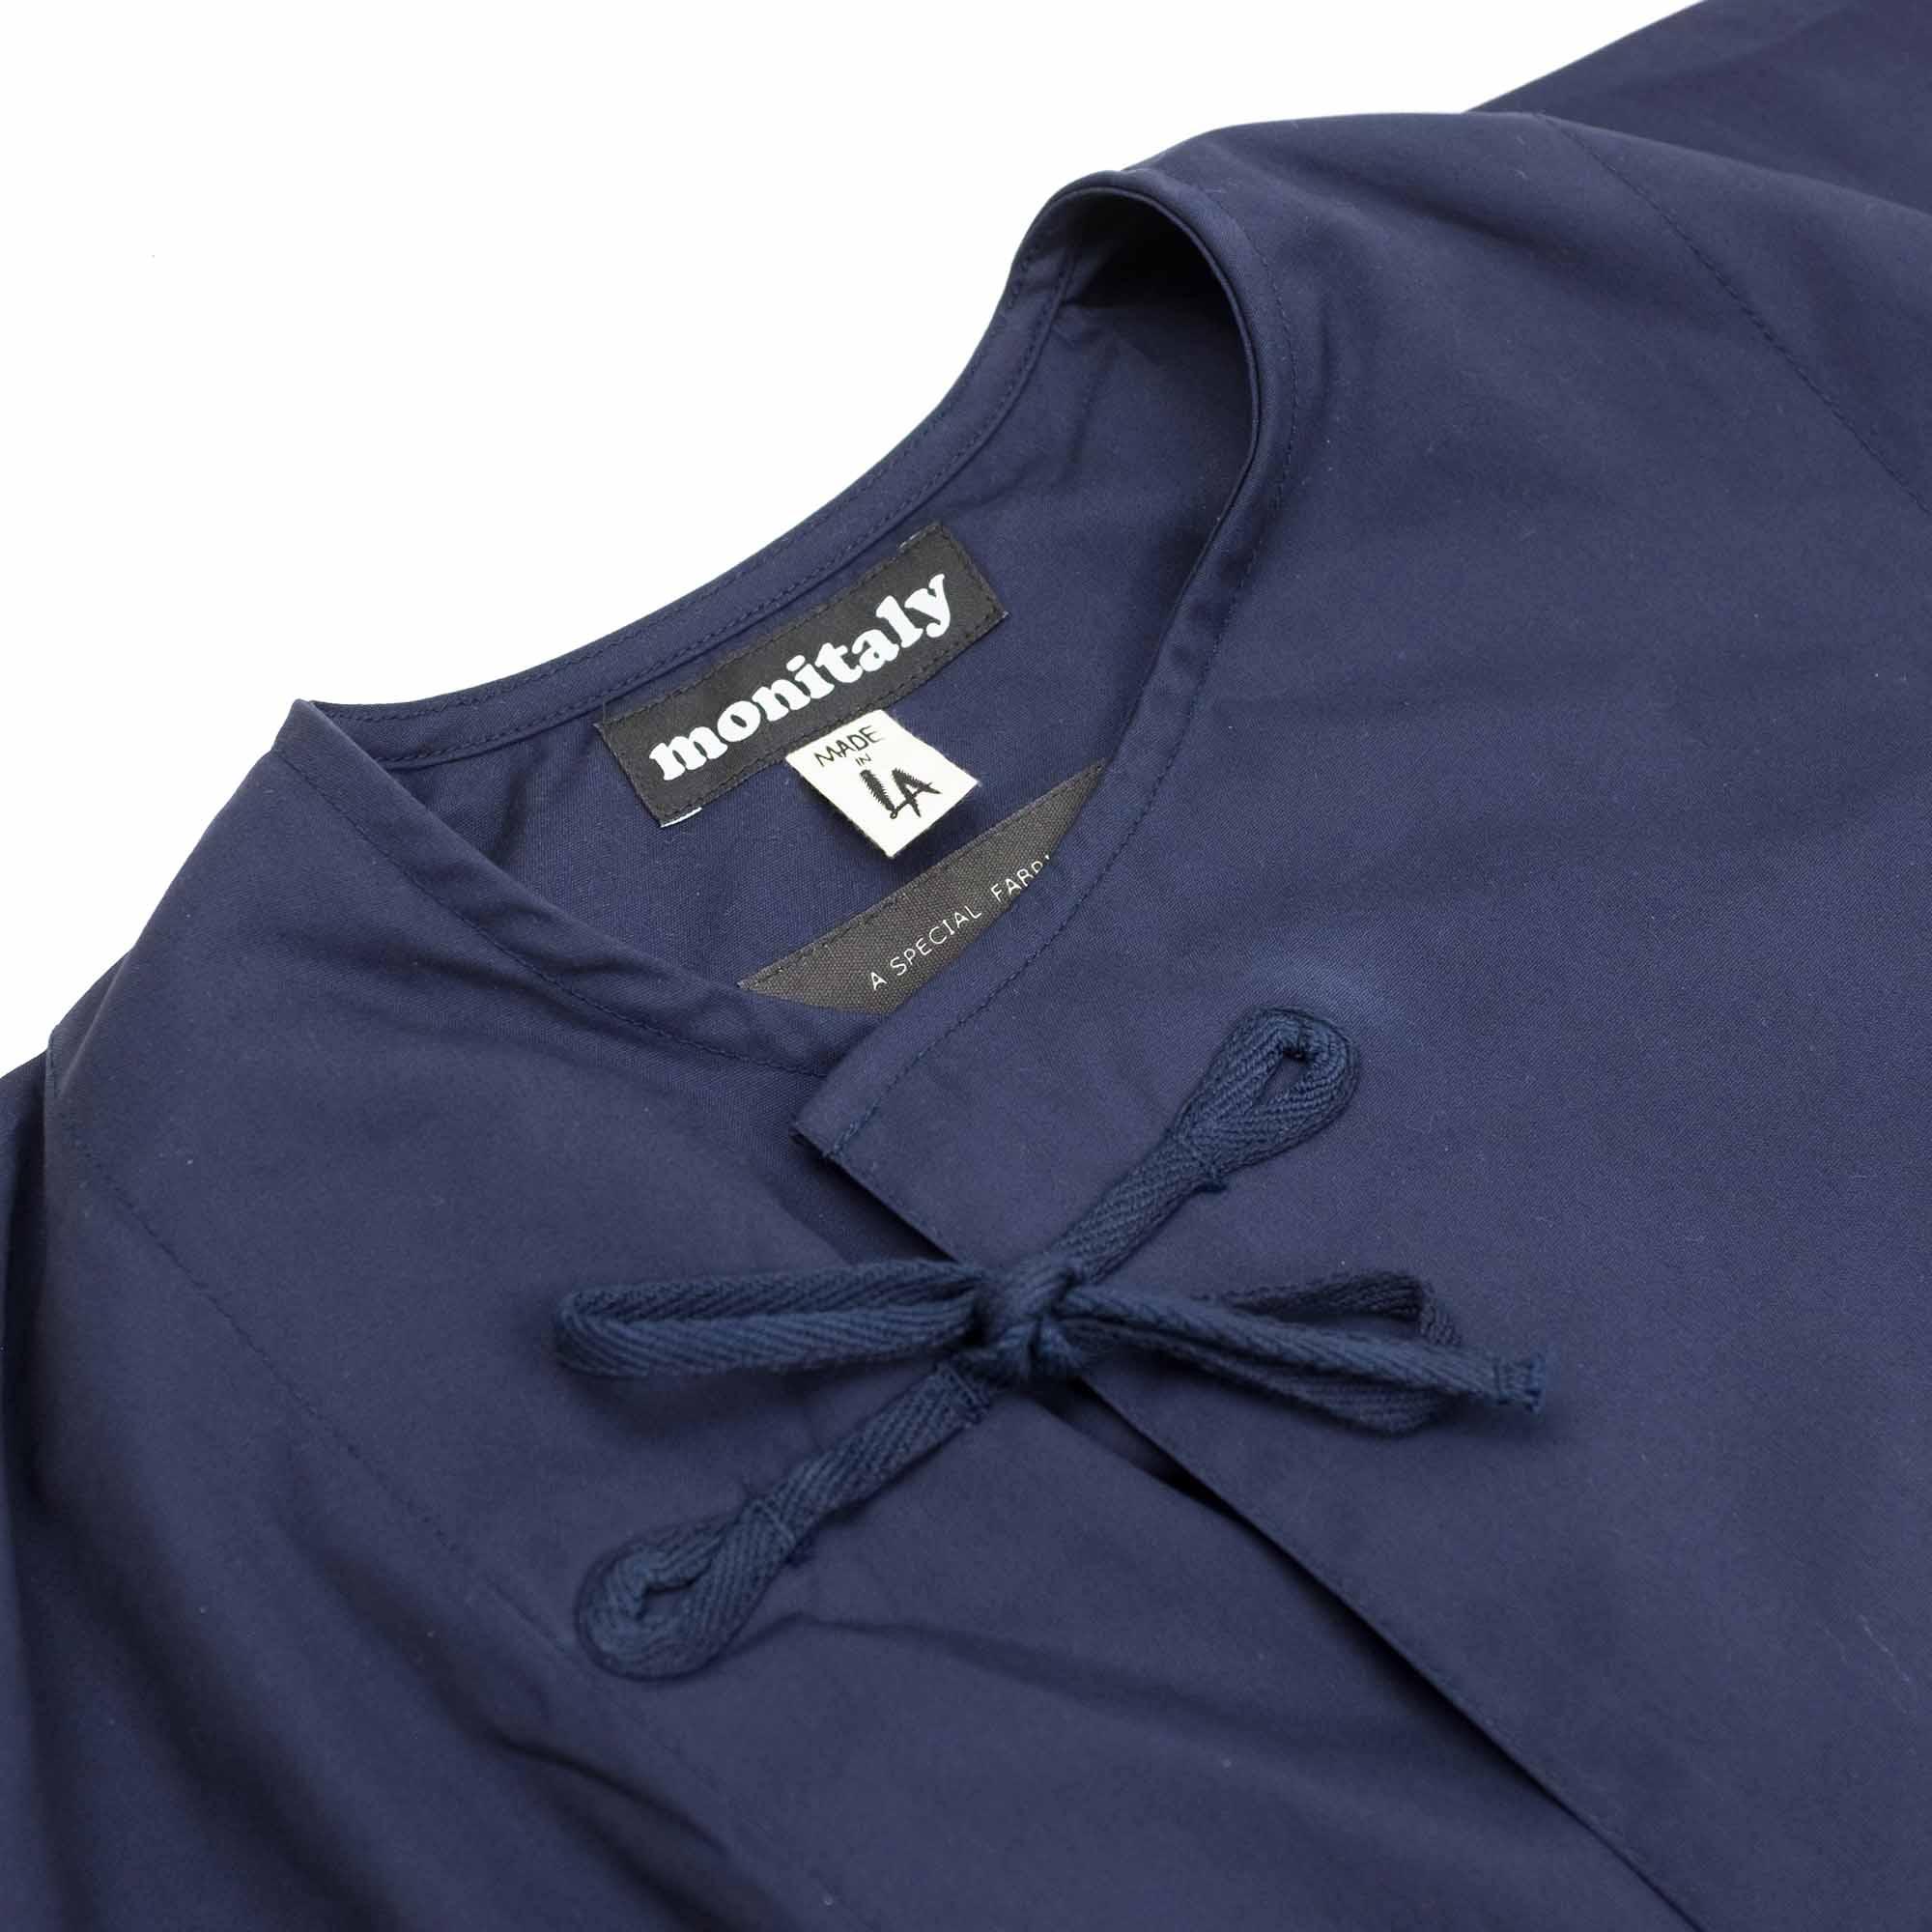 Monitaly Cropped Field Shell Jacket - Vancloth Oxford Navy